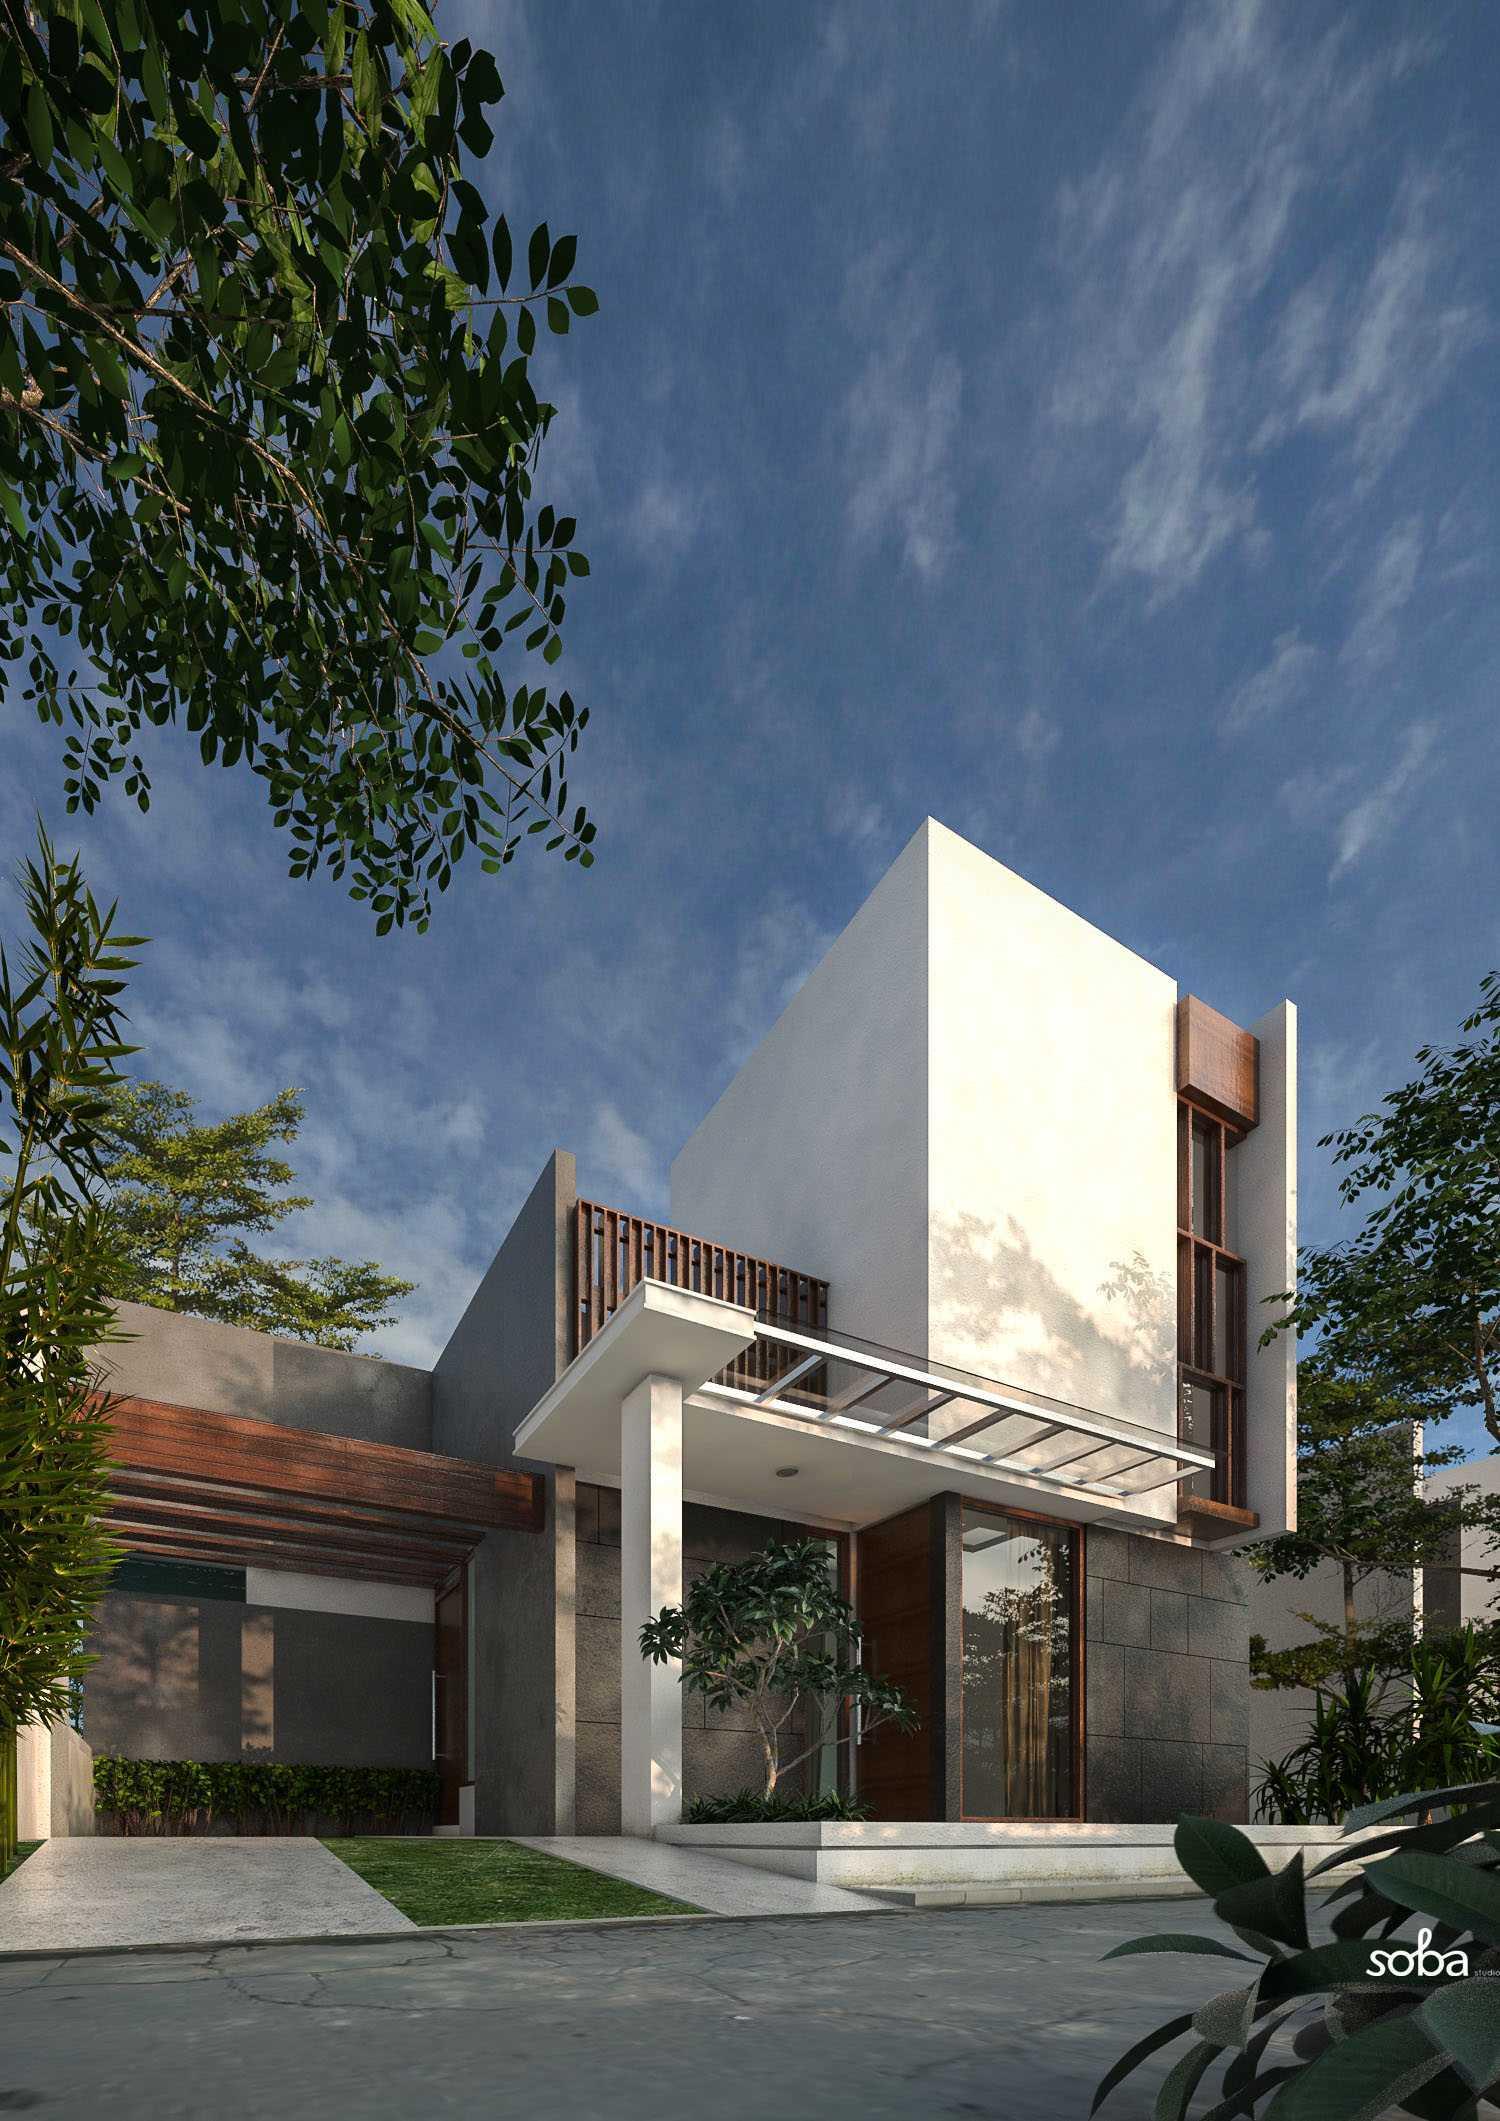 Sobastudia Fadilla House Martapura, Banjar, South Kalimantan, Indonesia Martapura Rumah-Fadillah-1 Kontemporer  11608